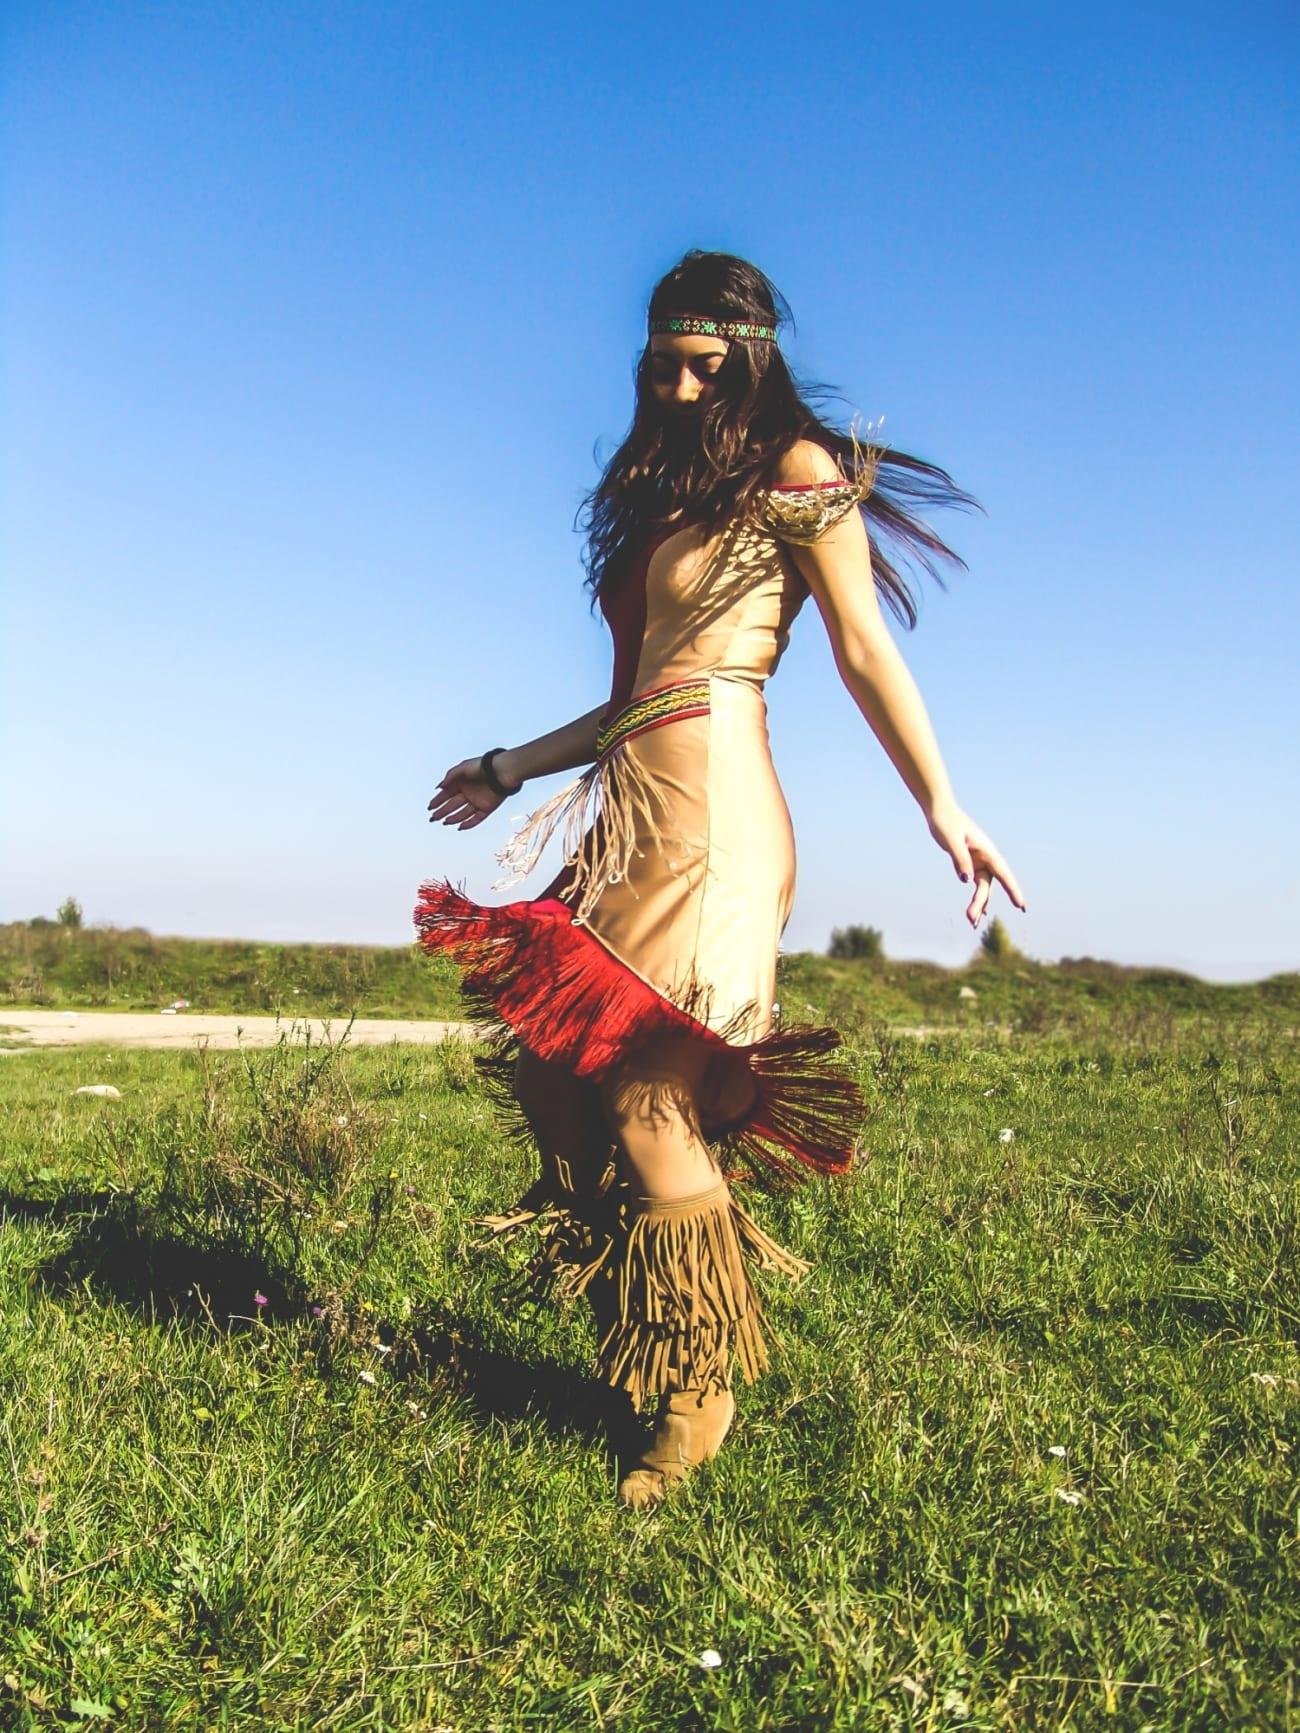 roxi rose fashion blog romania halloween indian native costume wildfashion (5)